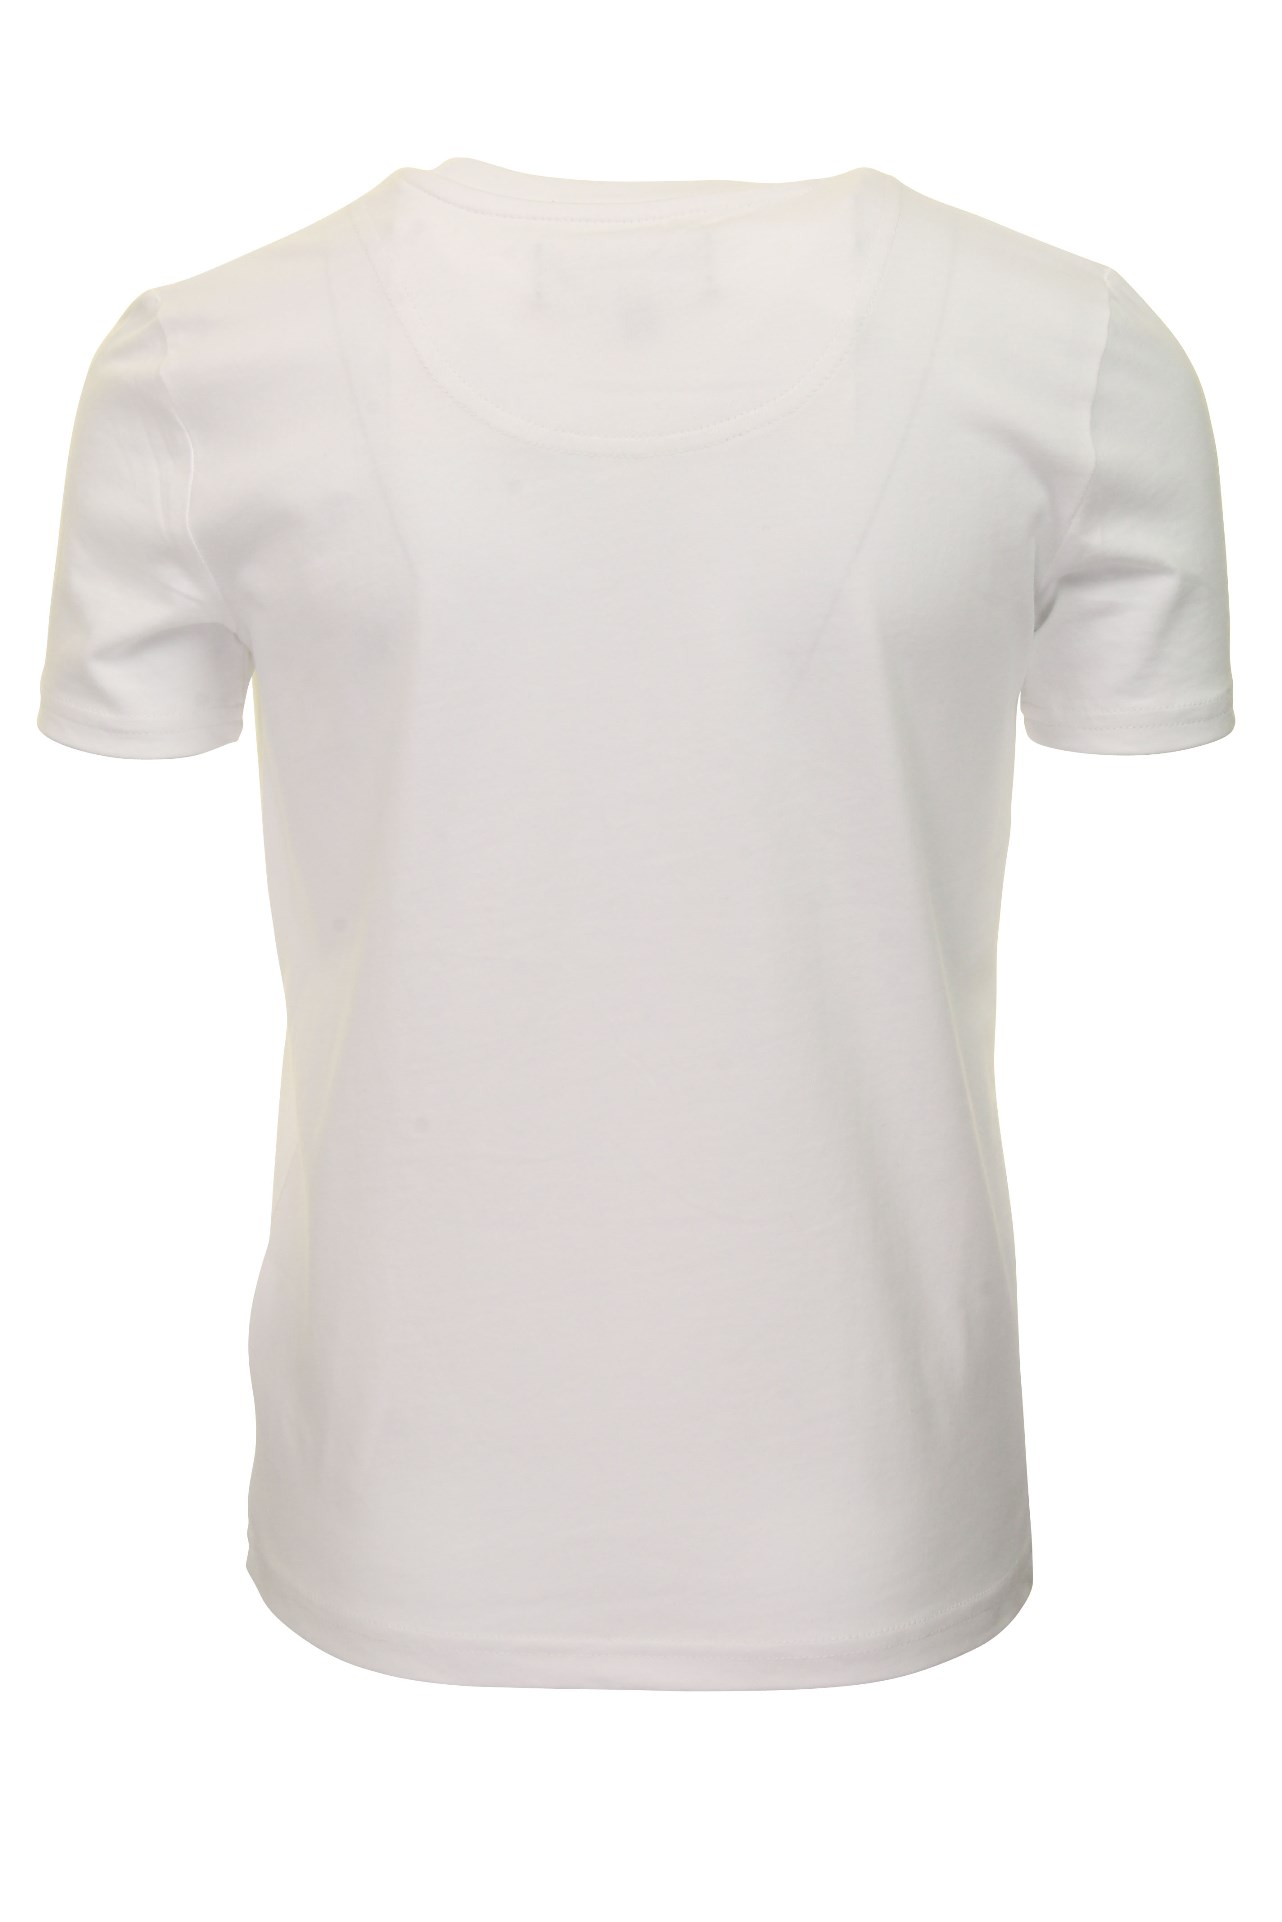 Lyle /& Scott Boys// Junior Classic Crew Neck T-Shirt